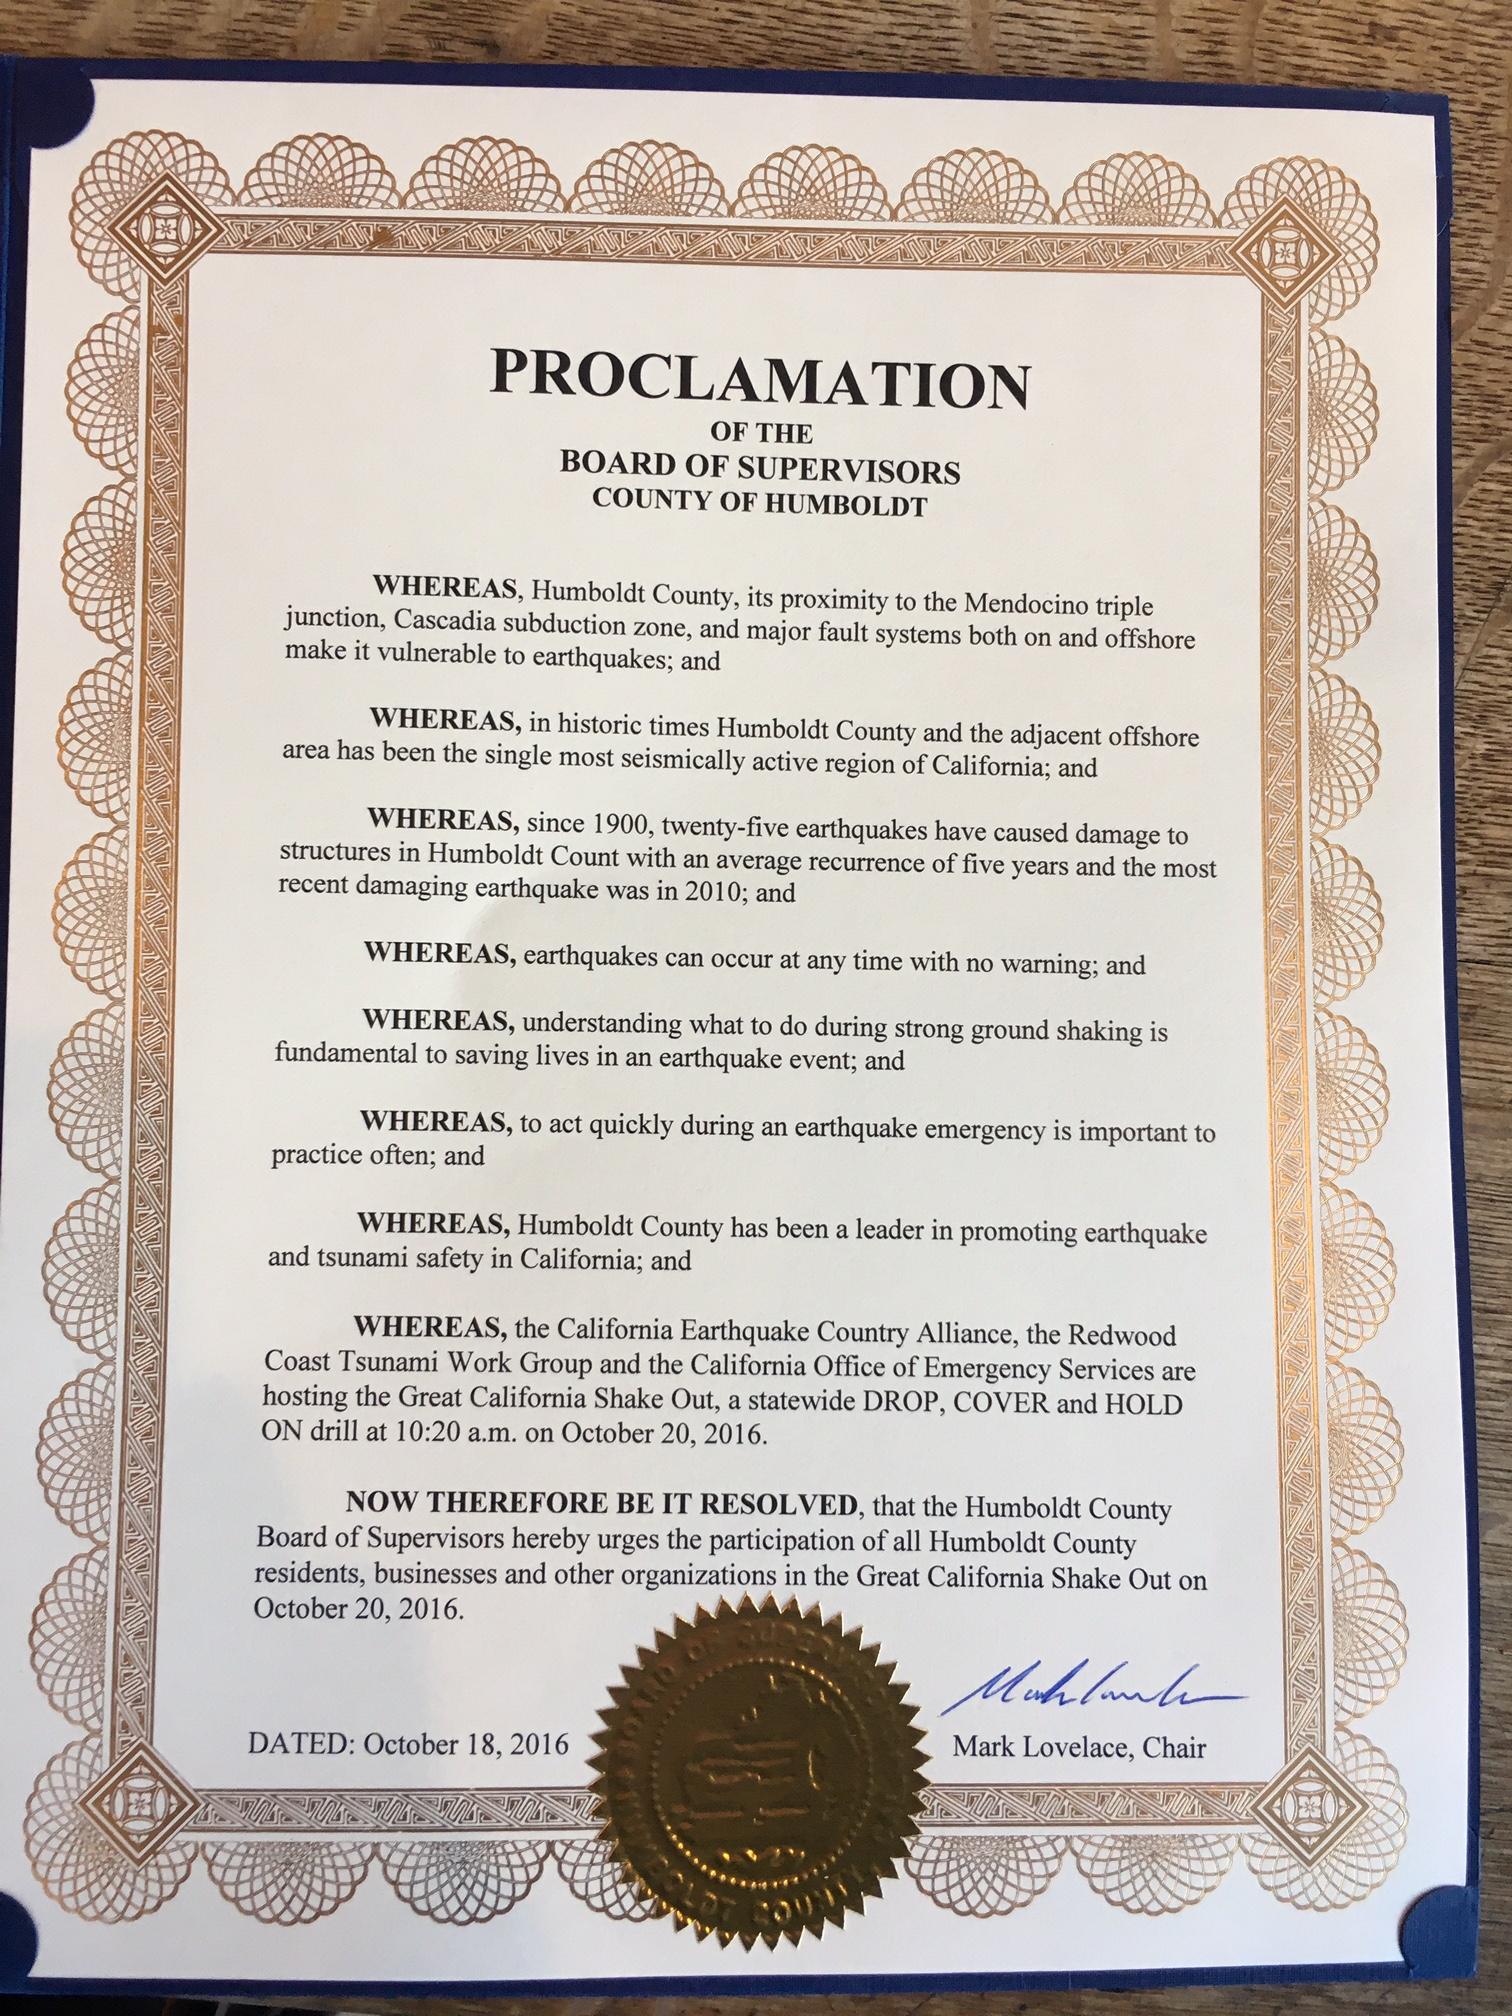 Humboldt County Proclamation